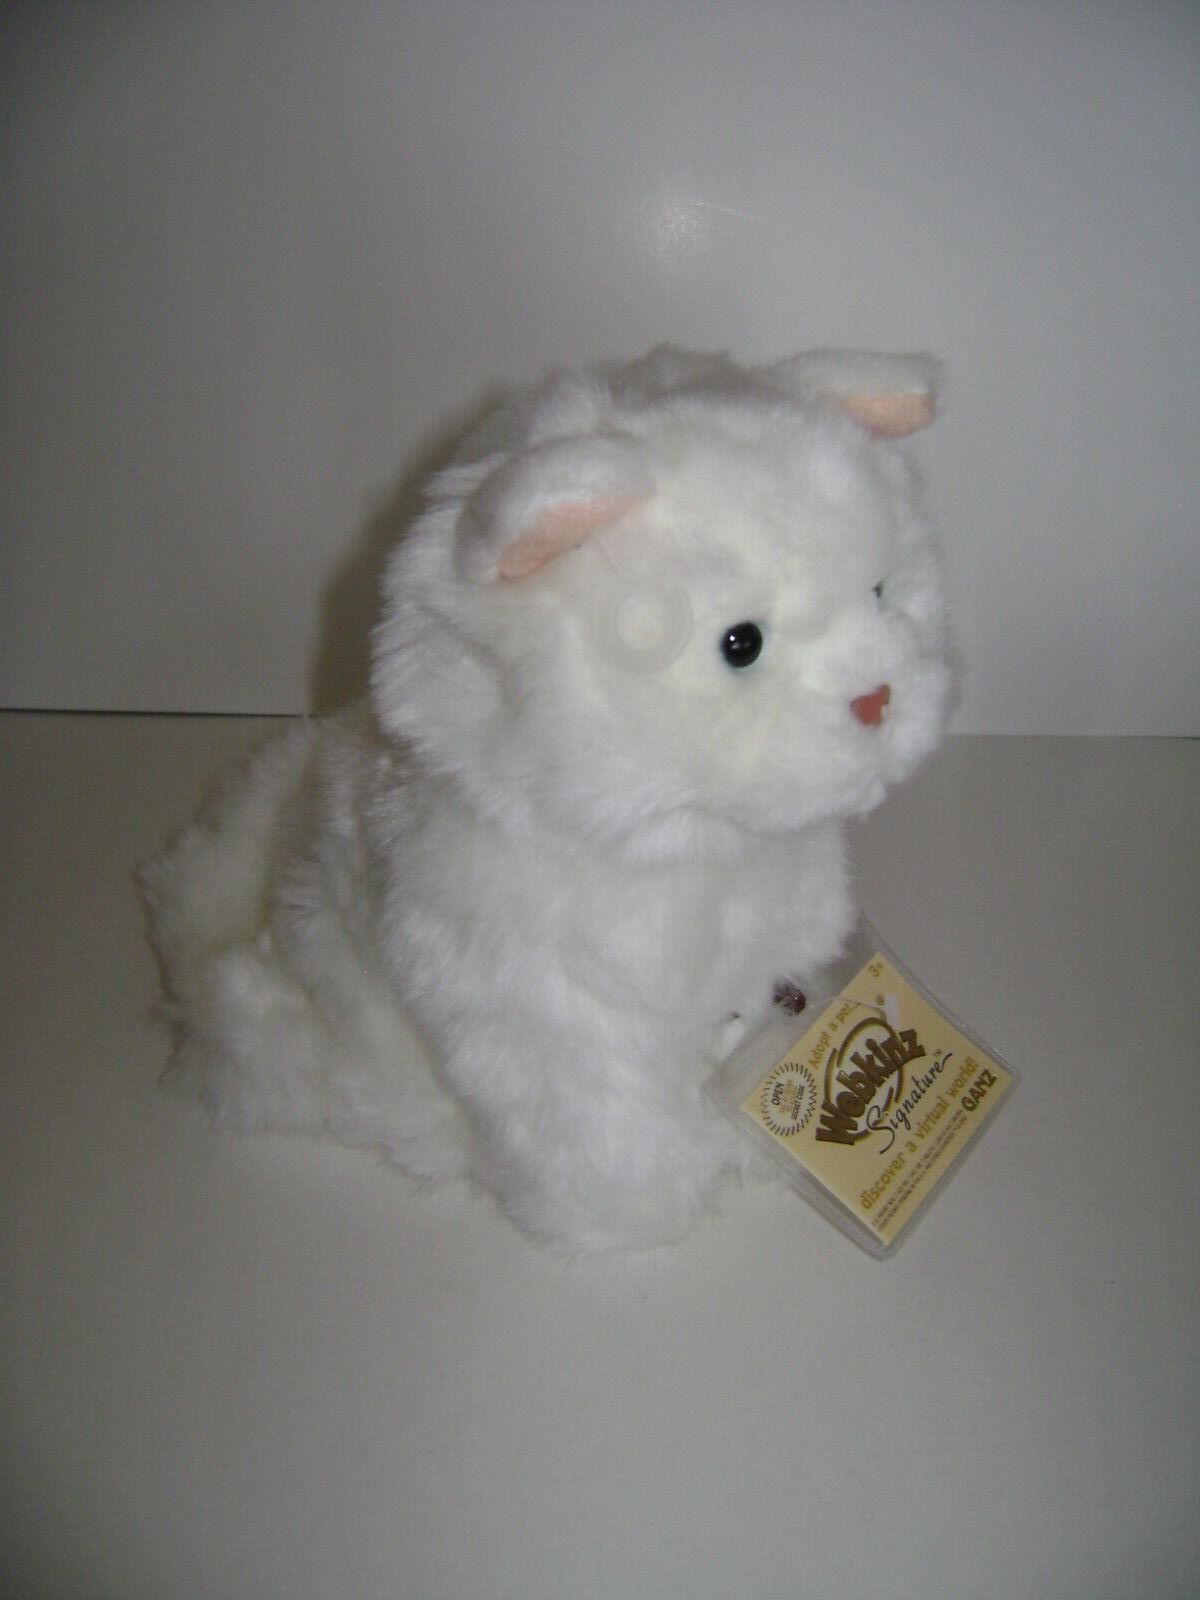 Webkinz Signature Weiß PERSIAN CAT  WKSS2003 GANZ  PLUSH STUFFED KITTY NEW CODE